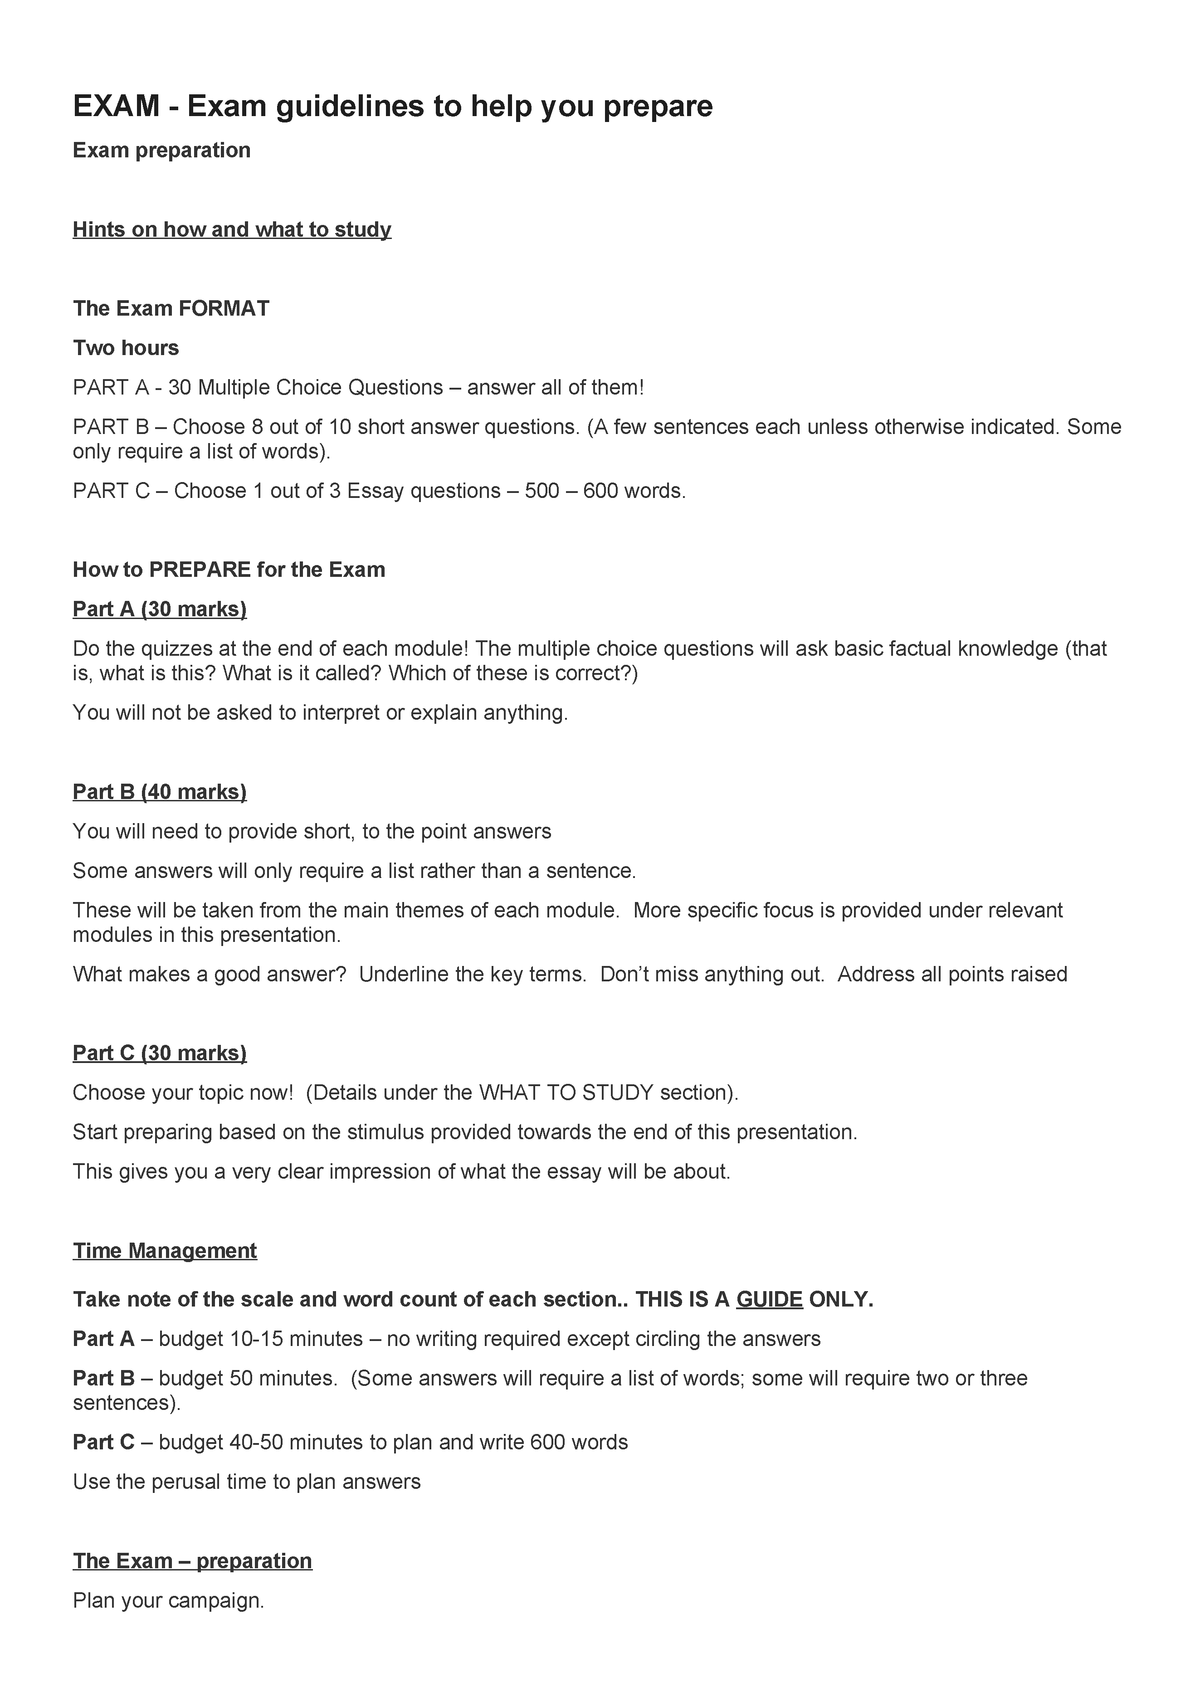 CMS1000 Assessment 4 Exam Info and Task Sheet - CMS1000